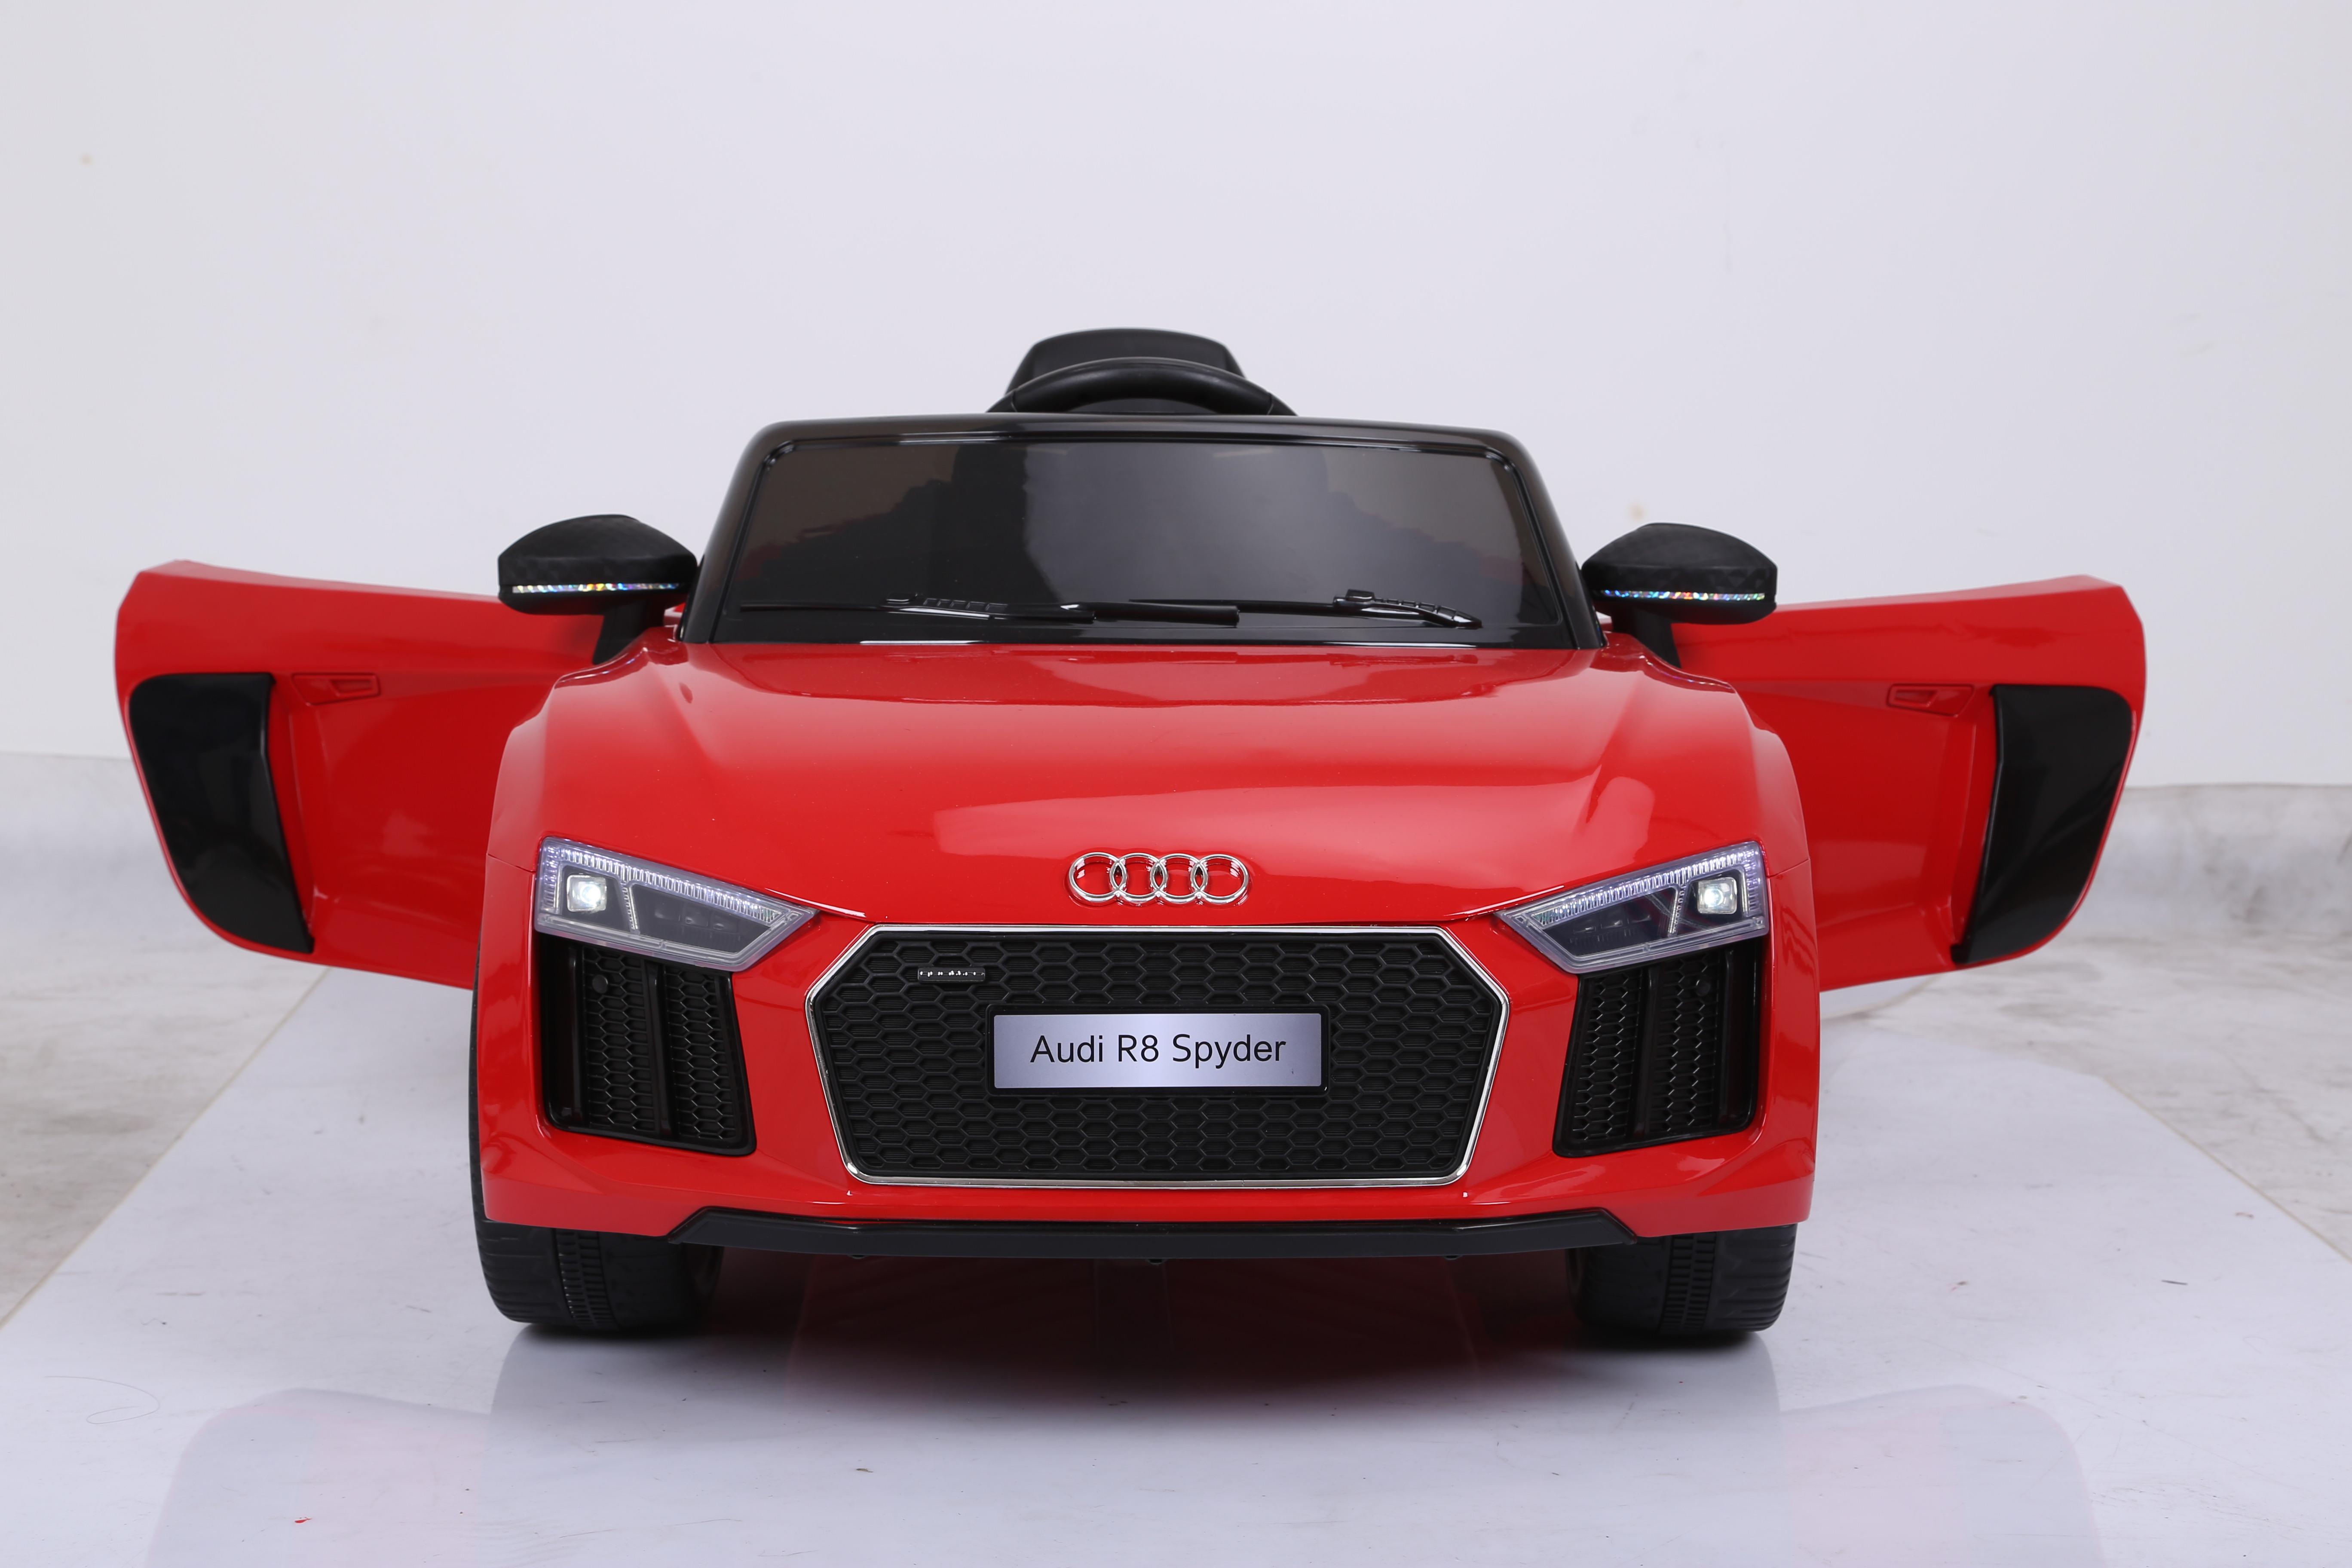 Ride On Cars For Kids: Audi R8 Licensed Kids Ride On Car 12v Remote Control Cars